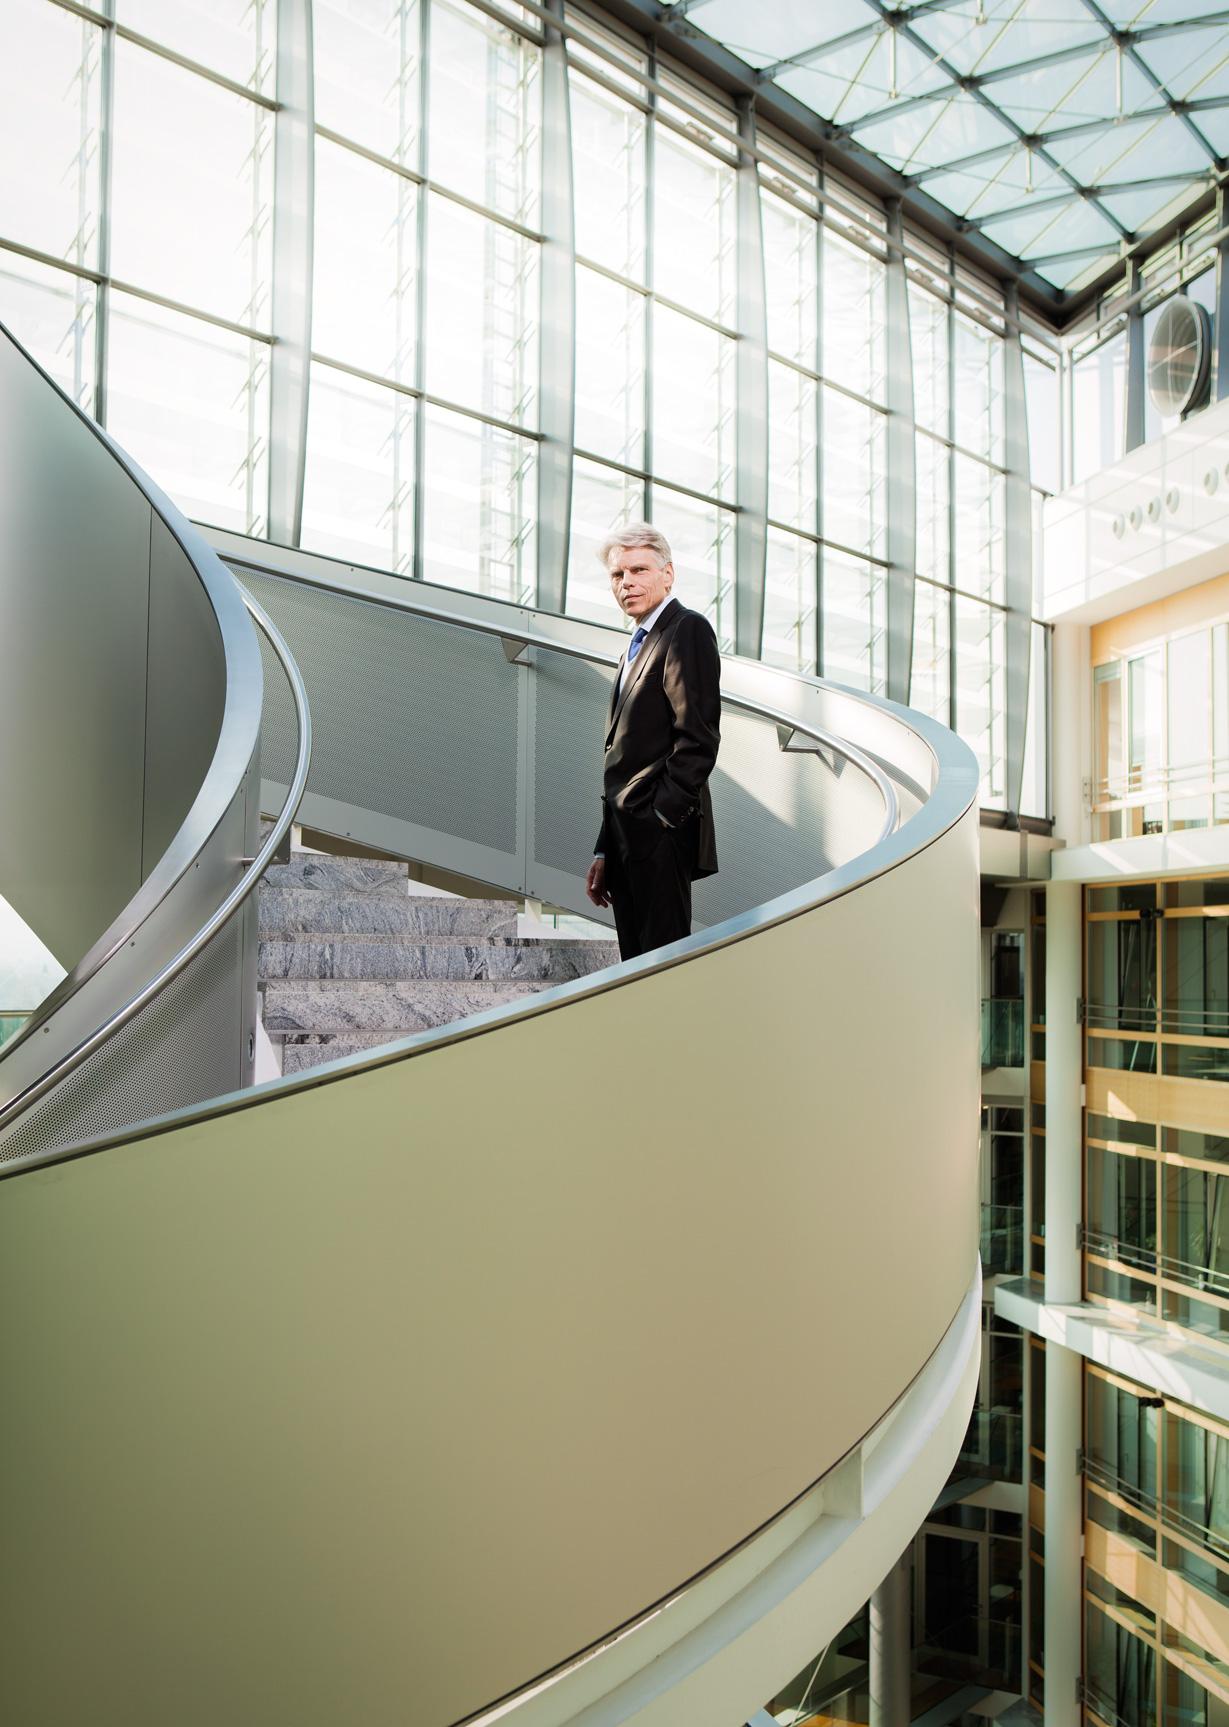 Prof. Dr. Dr. Andreas Barner - Boehringer Ingelheim